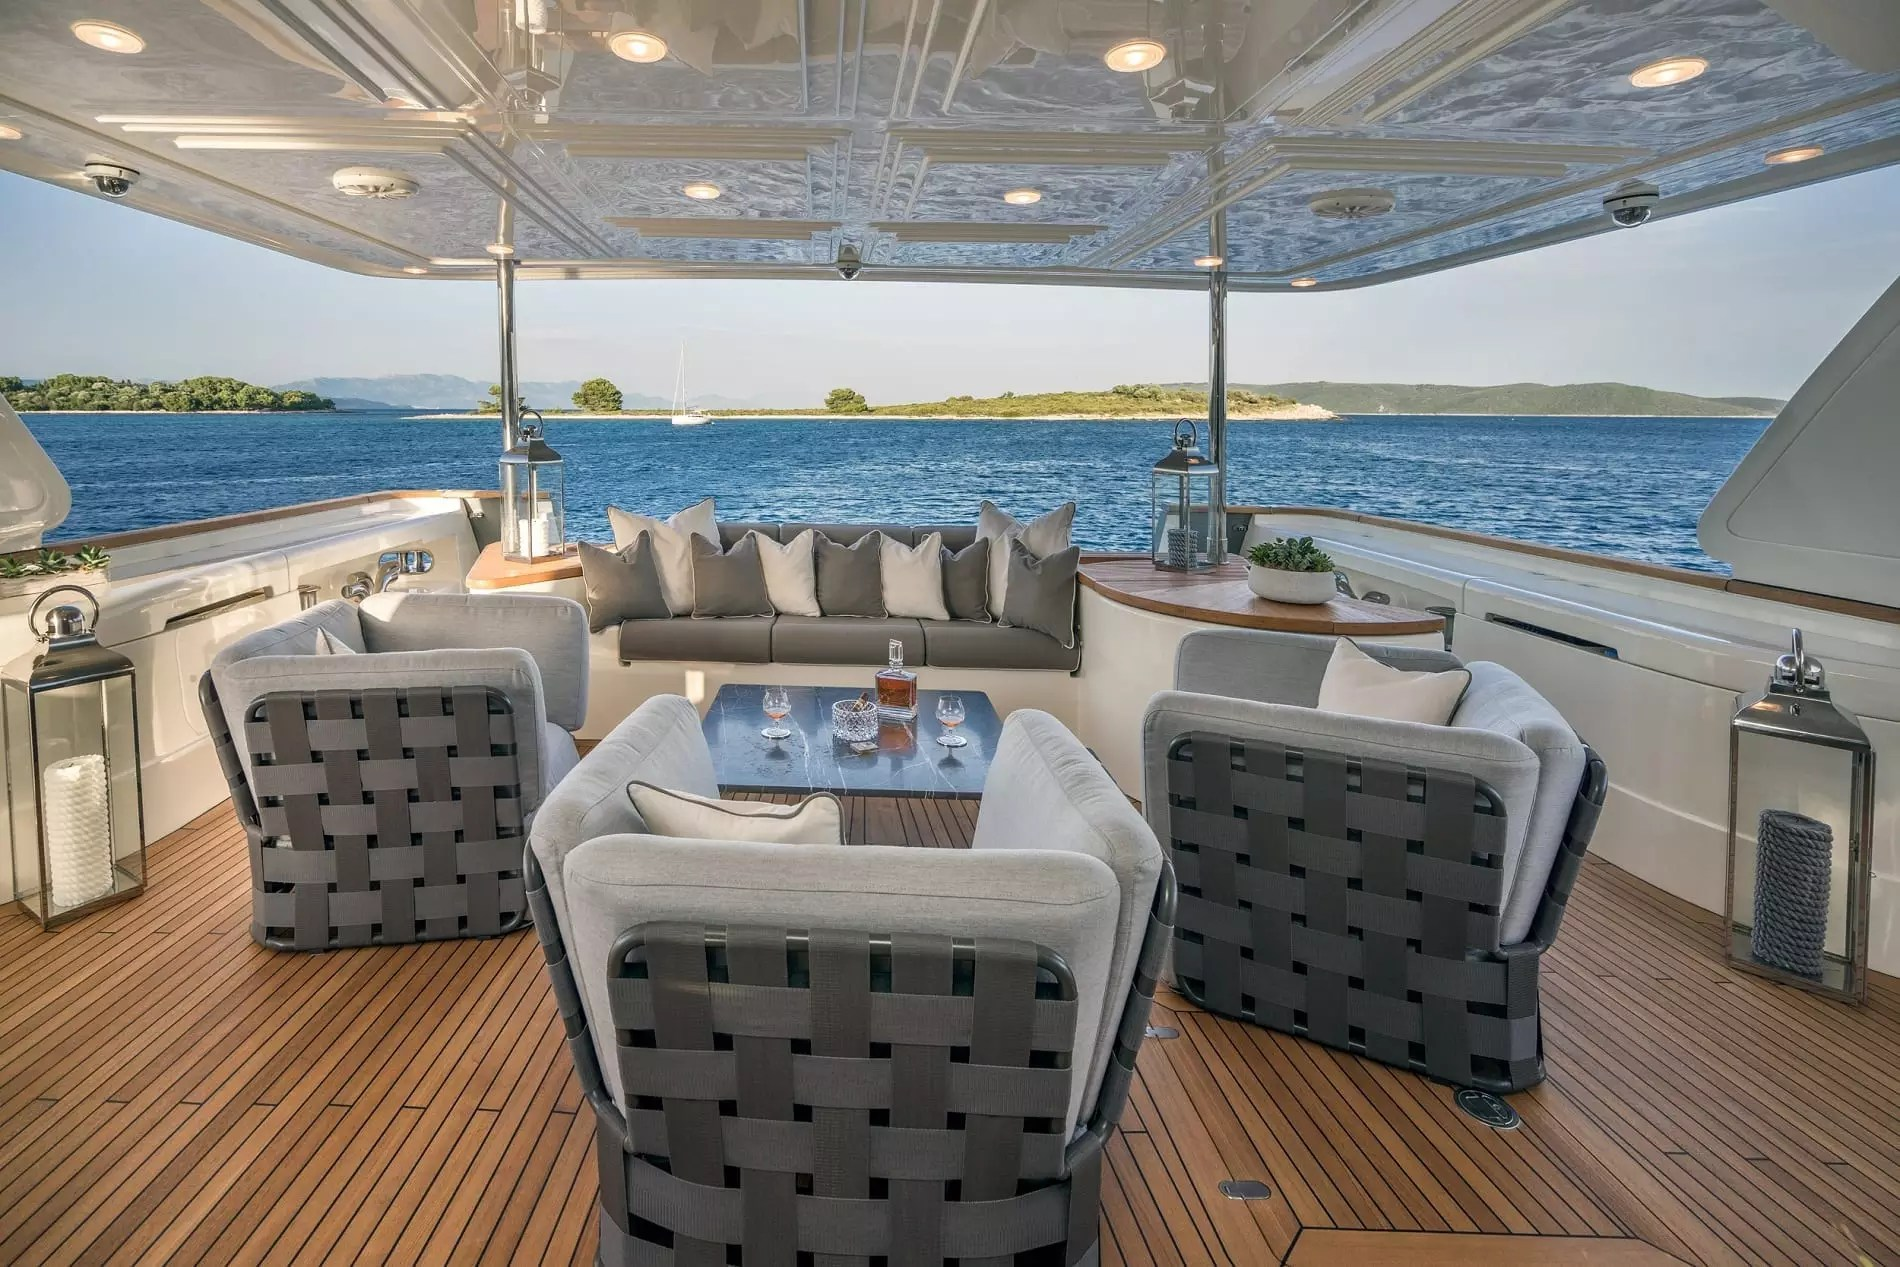 Seventh Sense 32M Yacht Charter Princess Yacht Charter